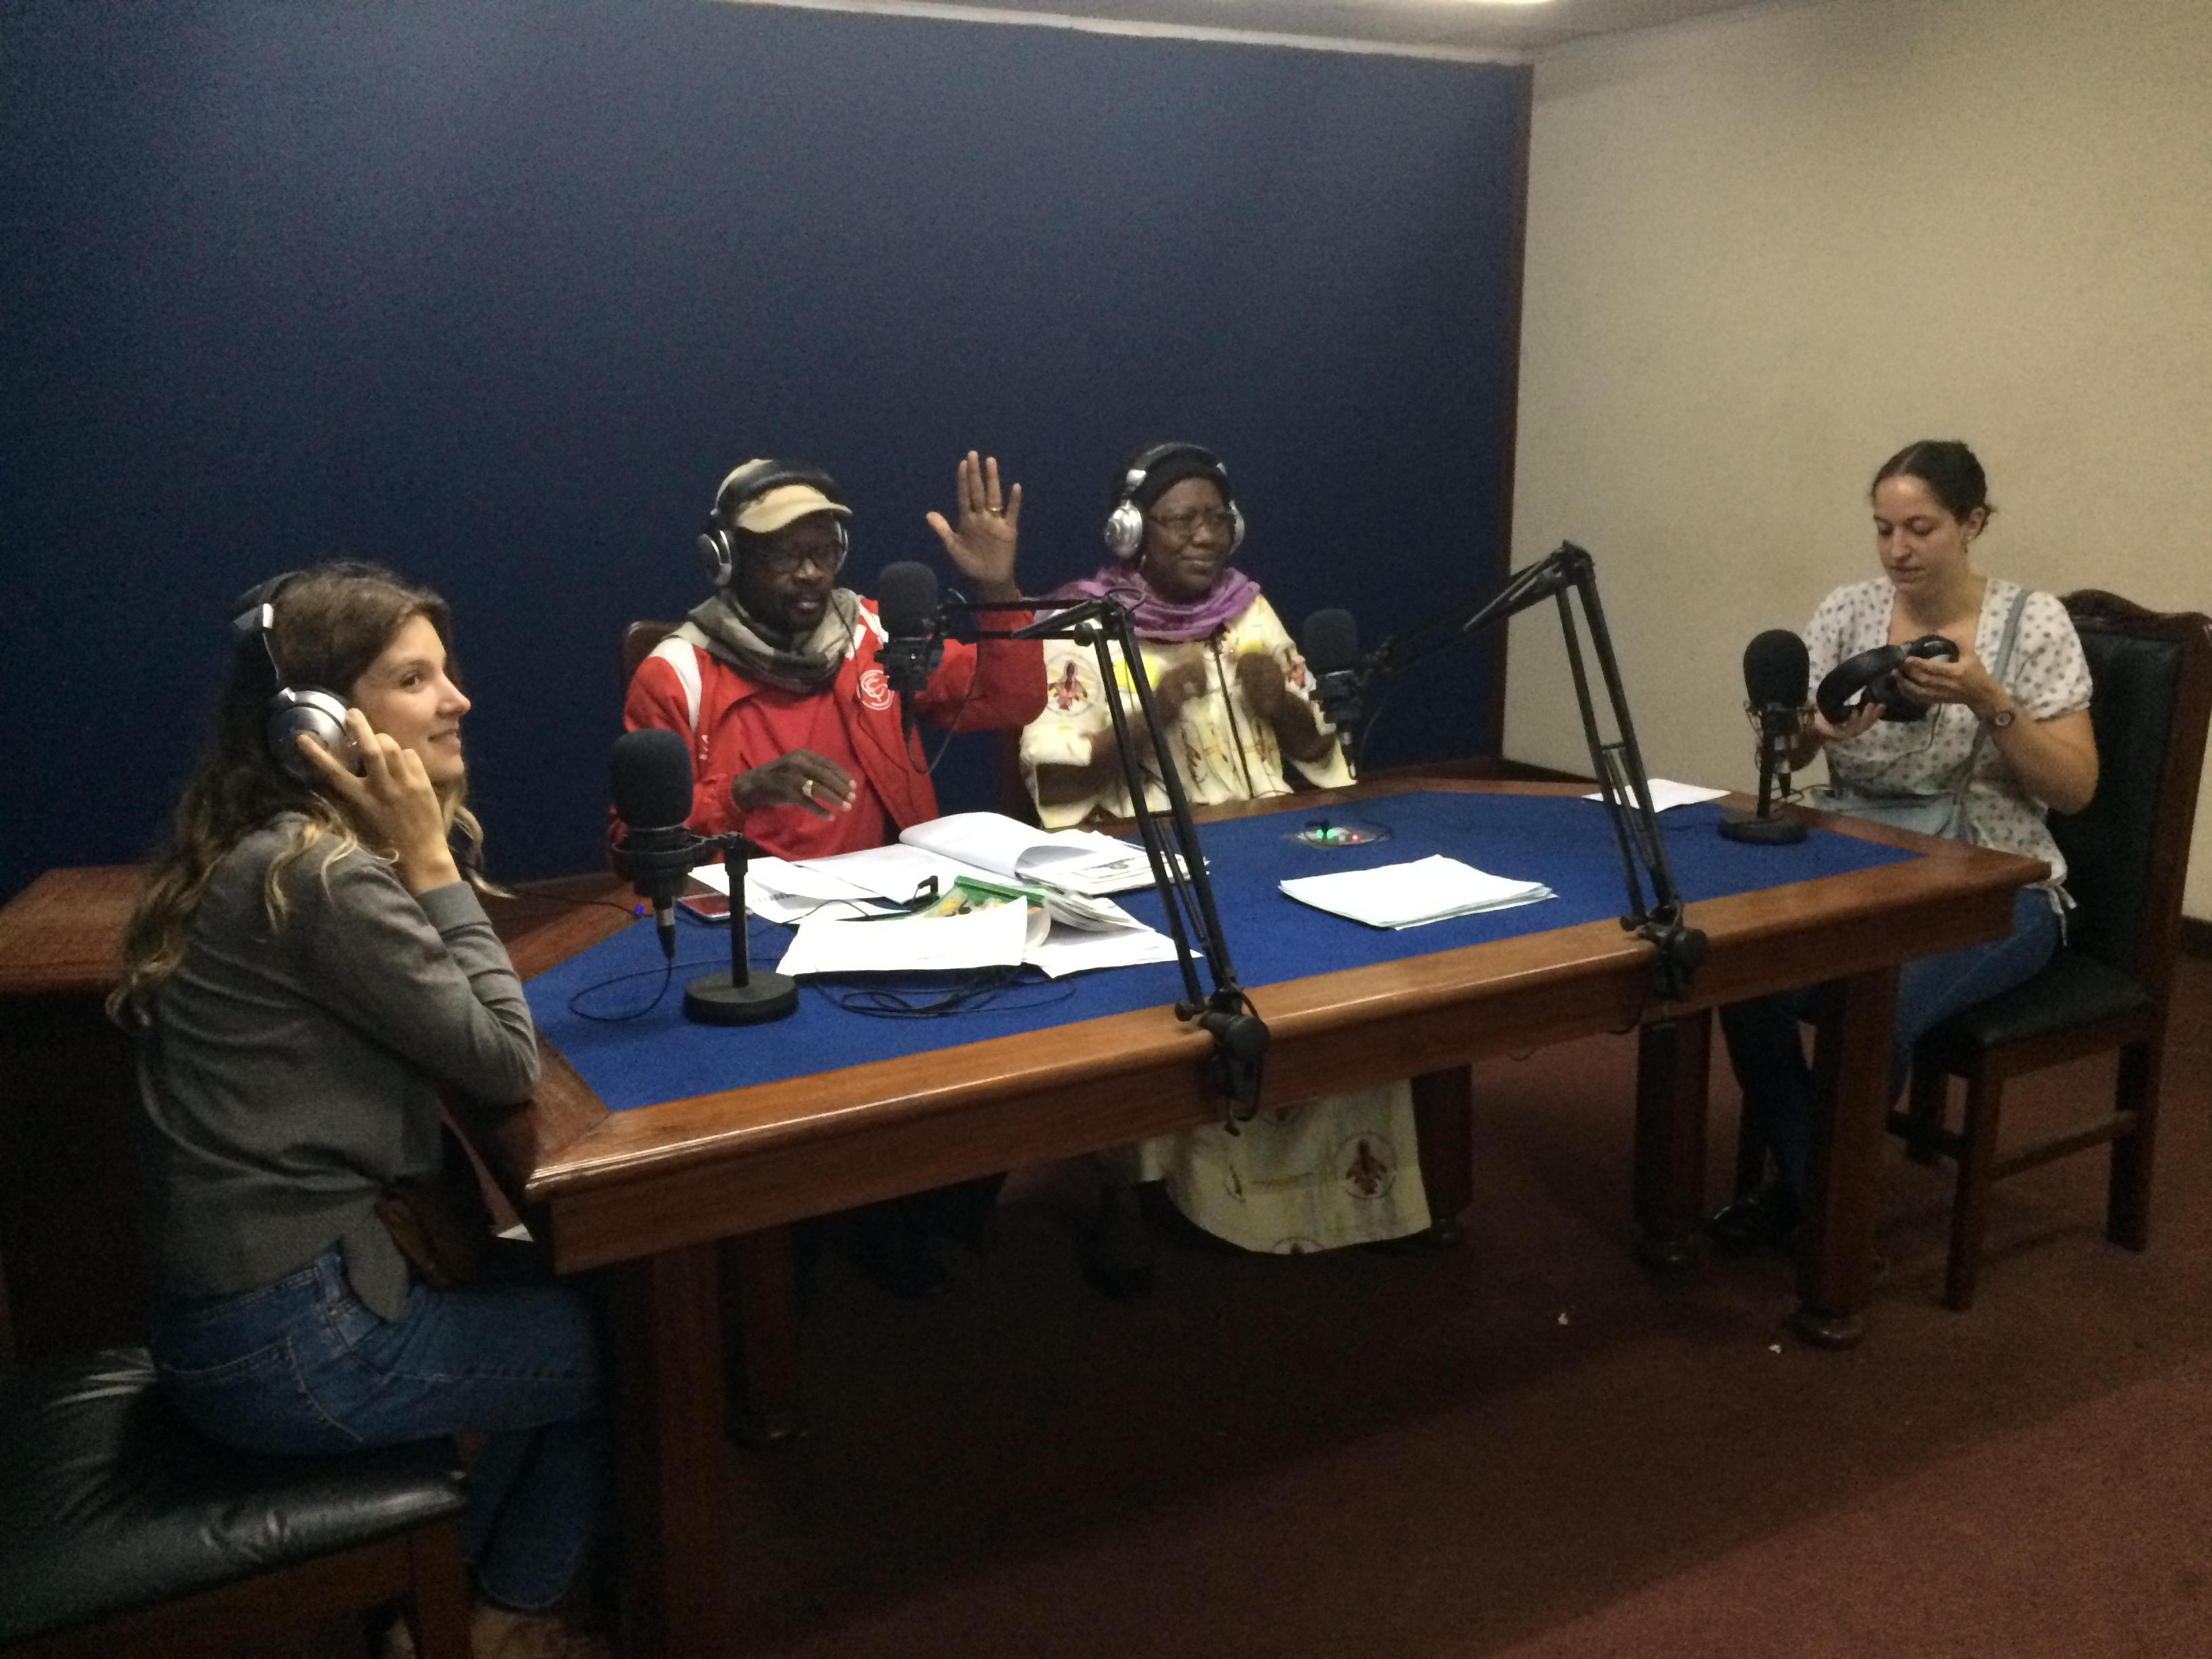 L'équipe d'ANI au Cameroun invitée à la radio nationale